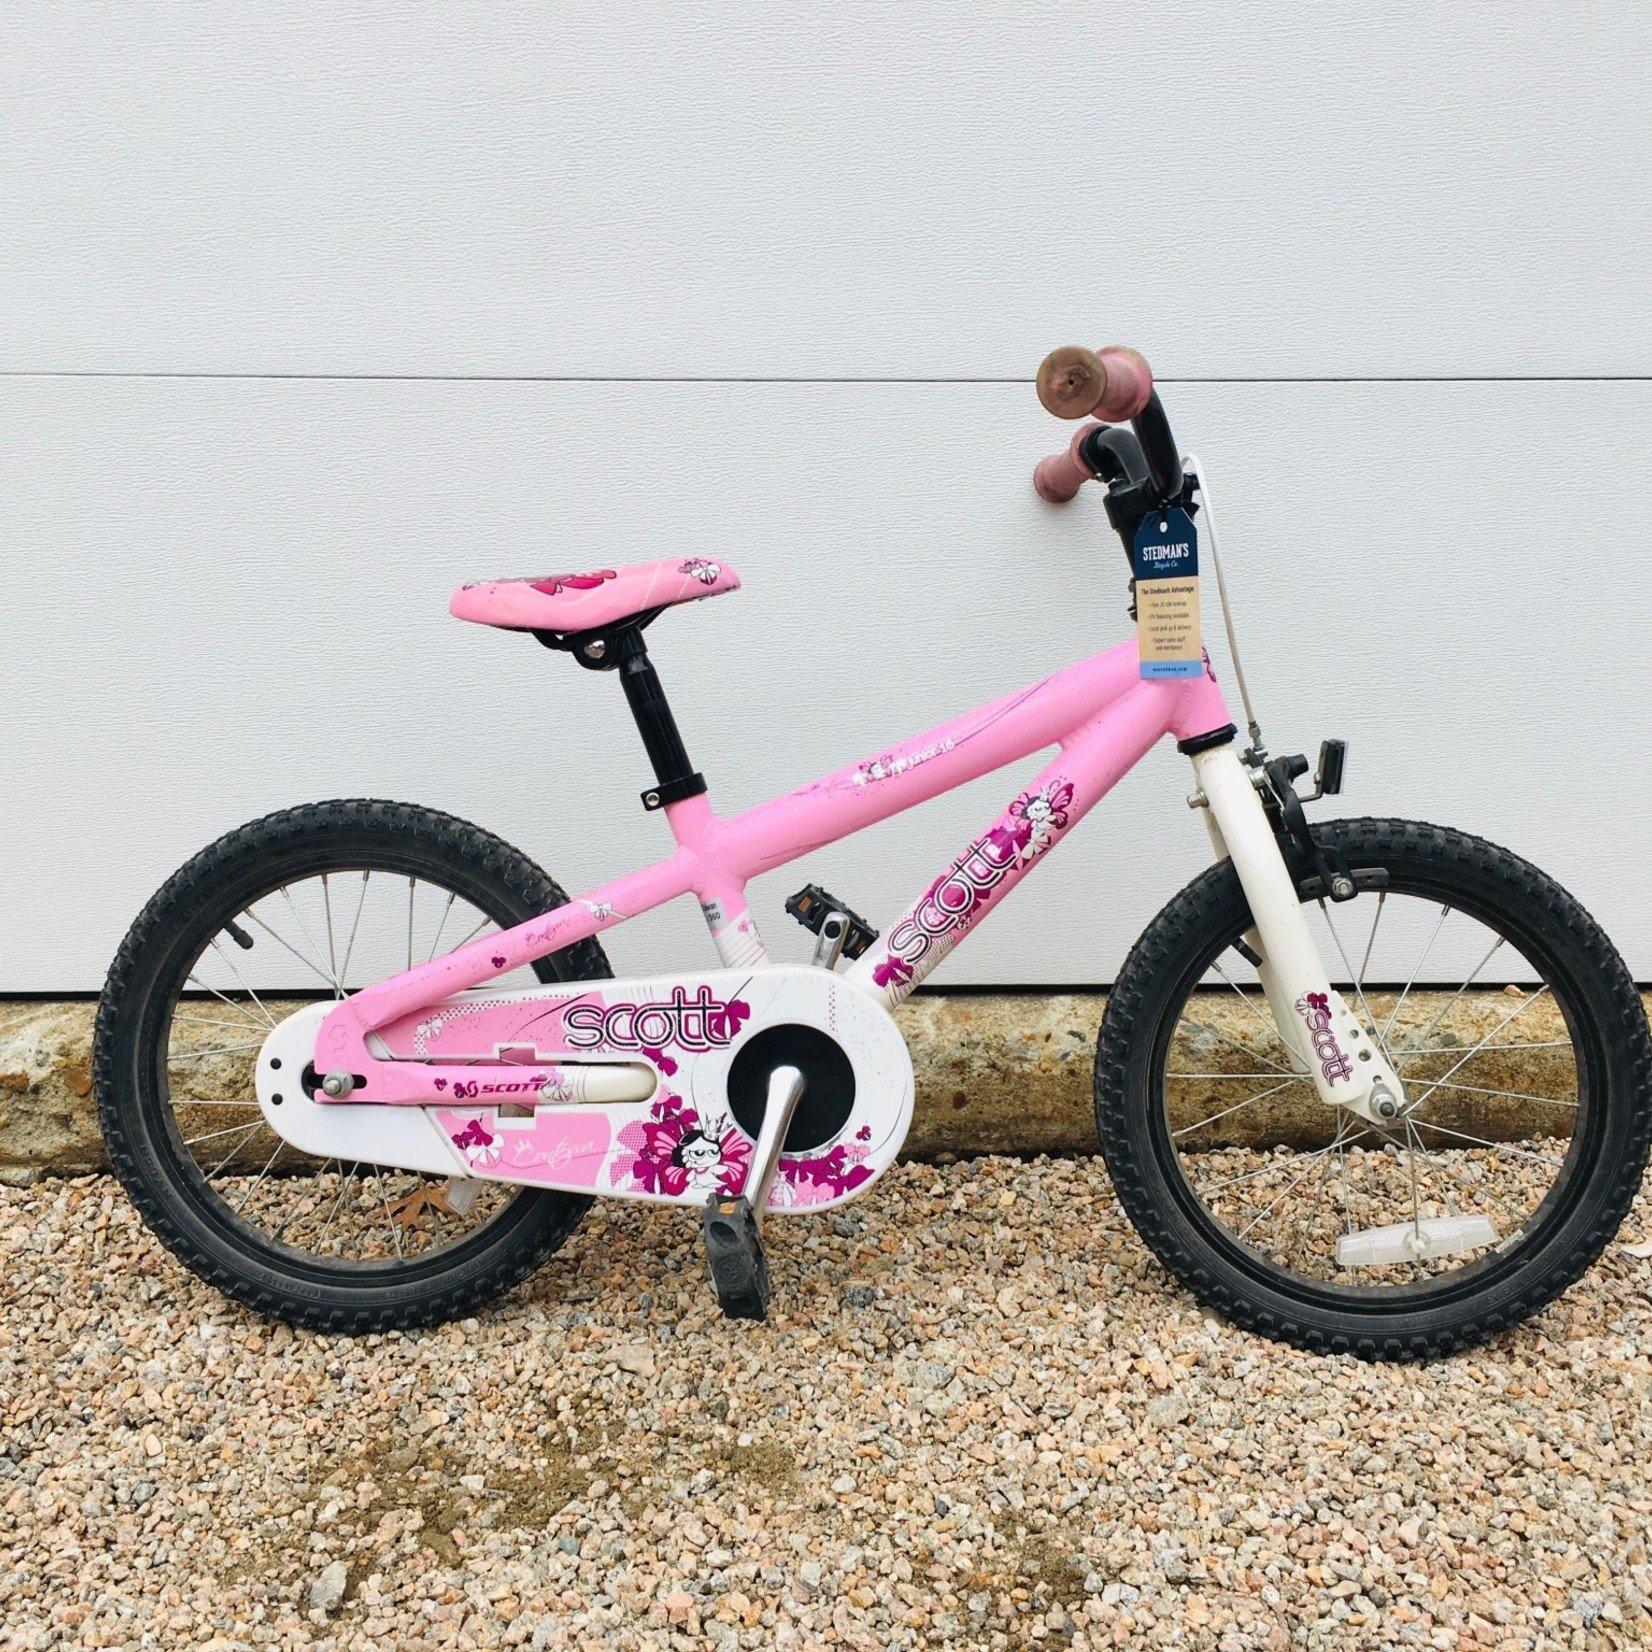 "Scott Scott 16"" Coaster Pink USED"